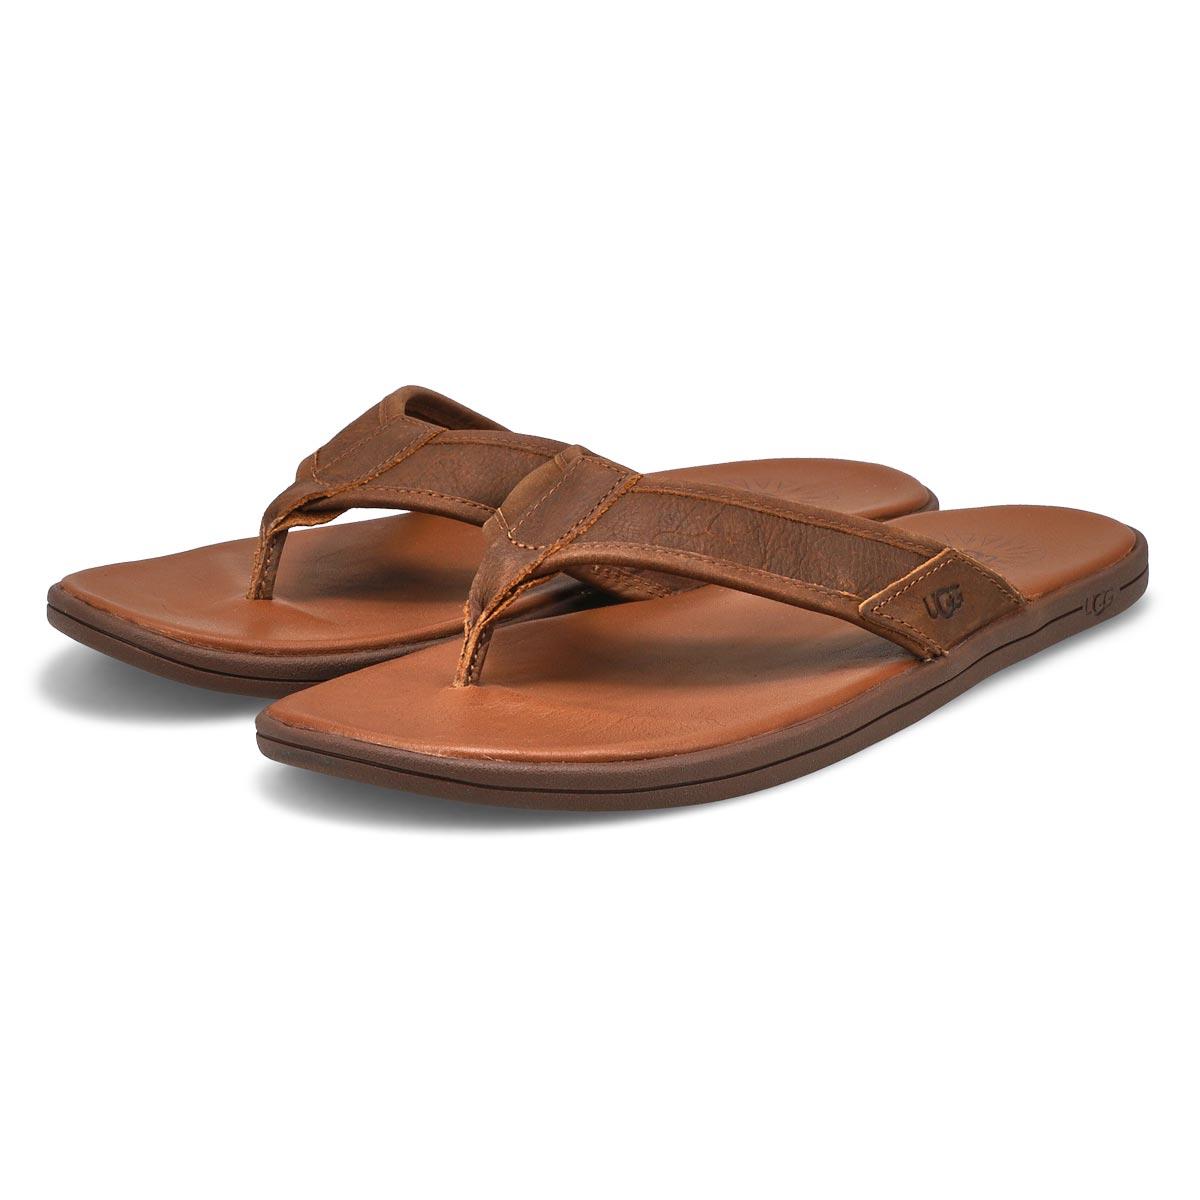 Tong Seaside Flip Leather,bagage, hom